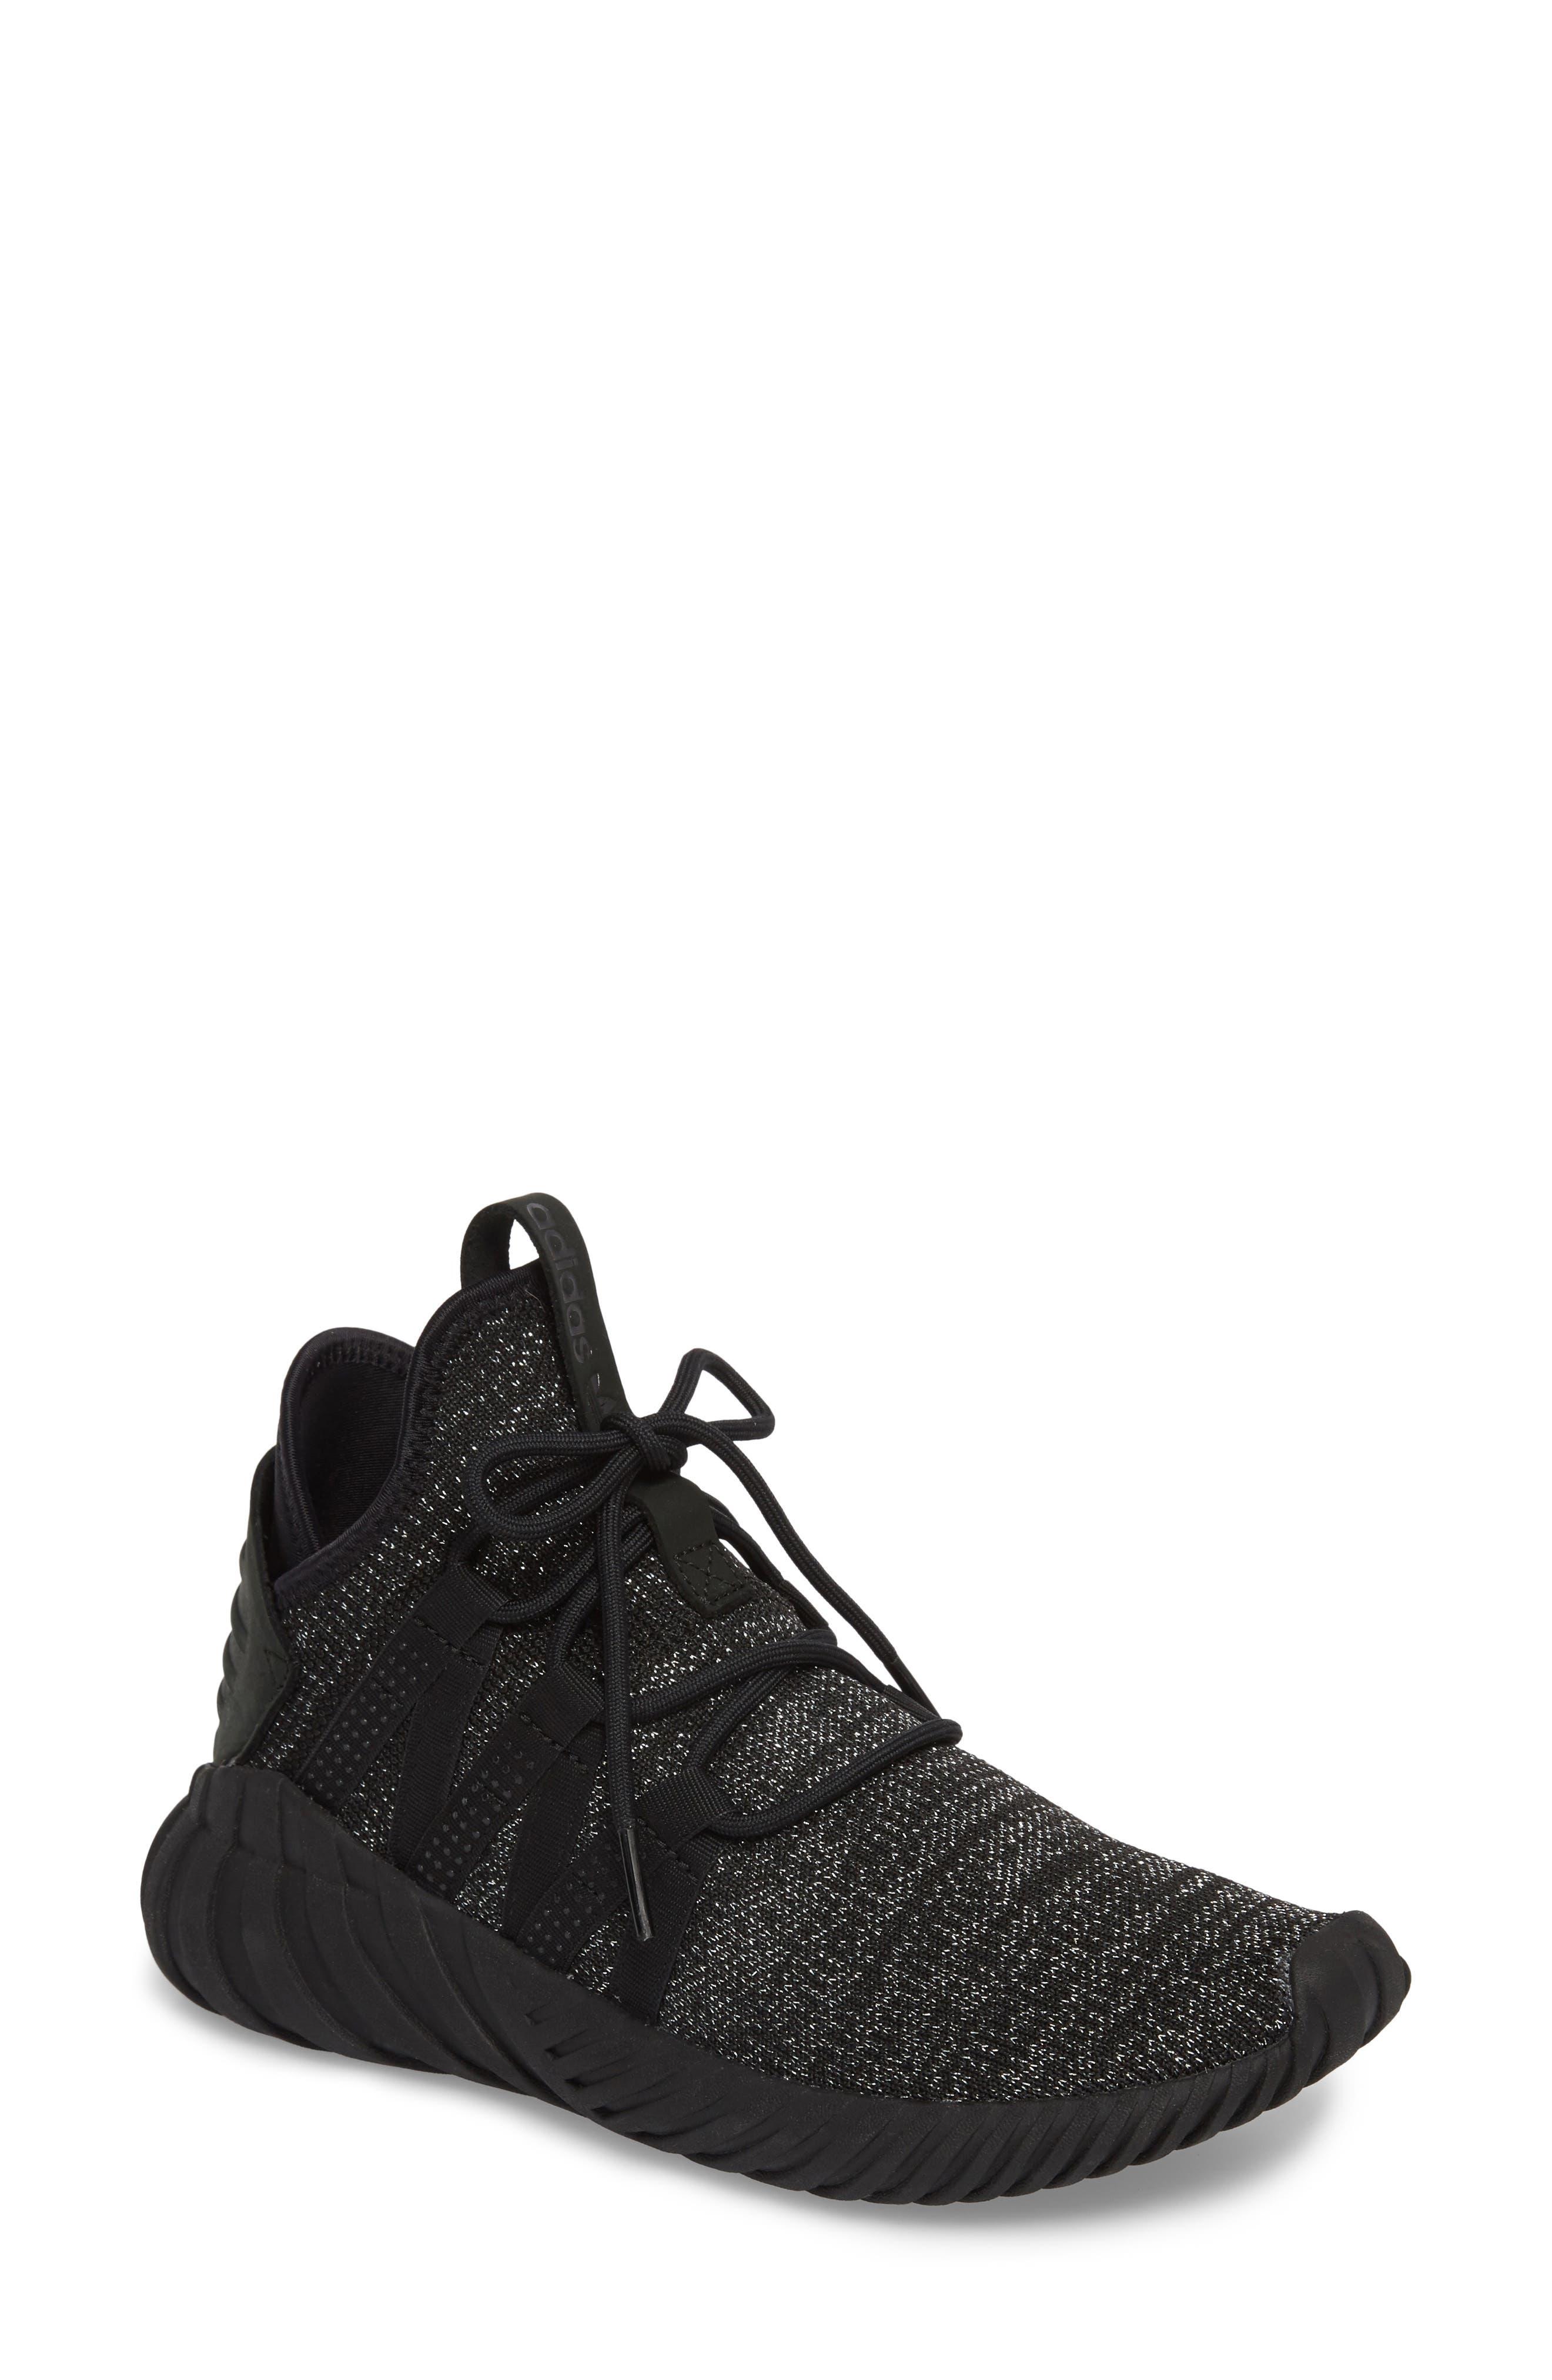 56bc65314dd2b1 Adidas Originals Adidas Women S Tubular Dawn Originals Running Shoe In Core  Black